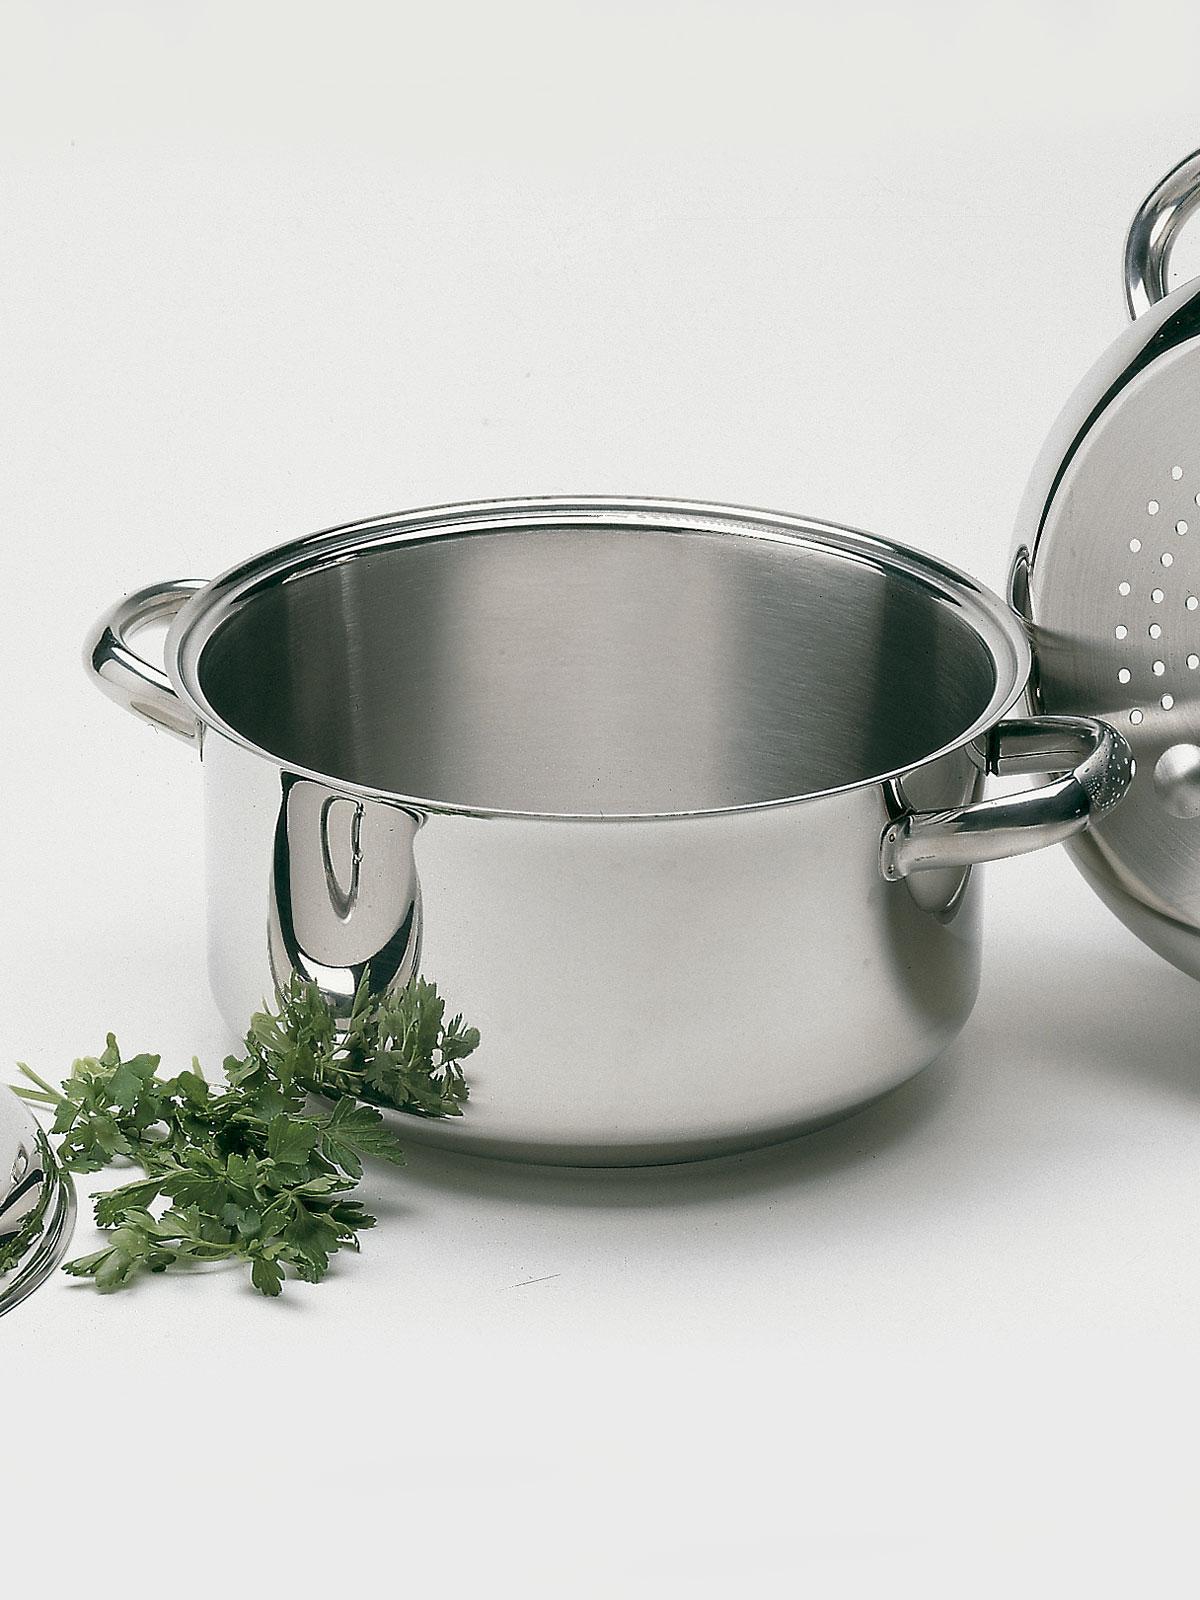 Al34090000 vaporera 3 alza utensilios de cocina menaje for Utensilios de menaje